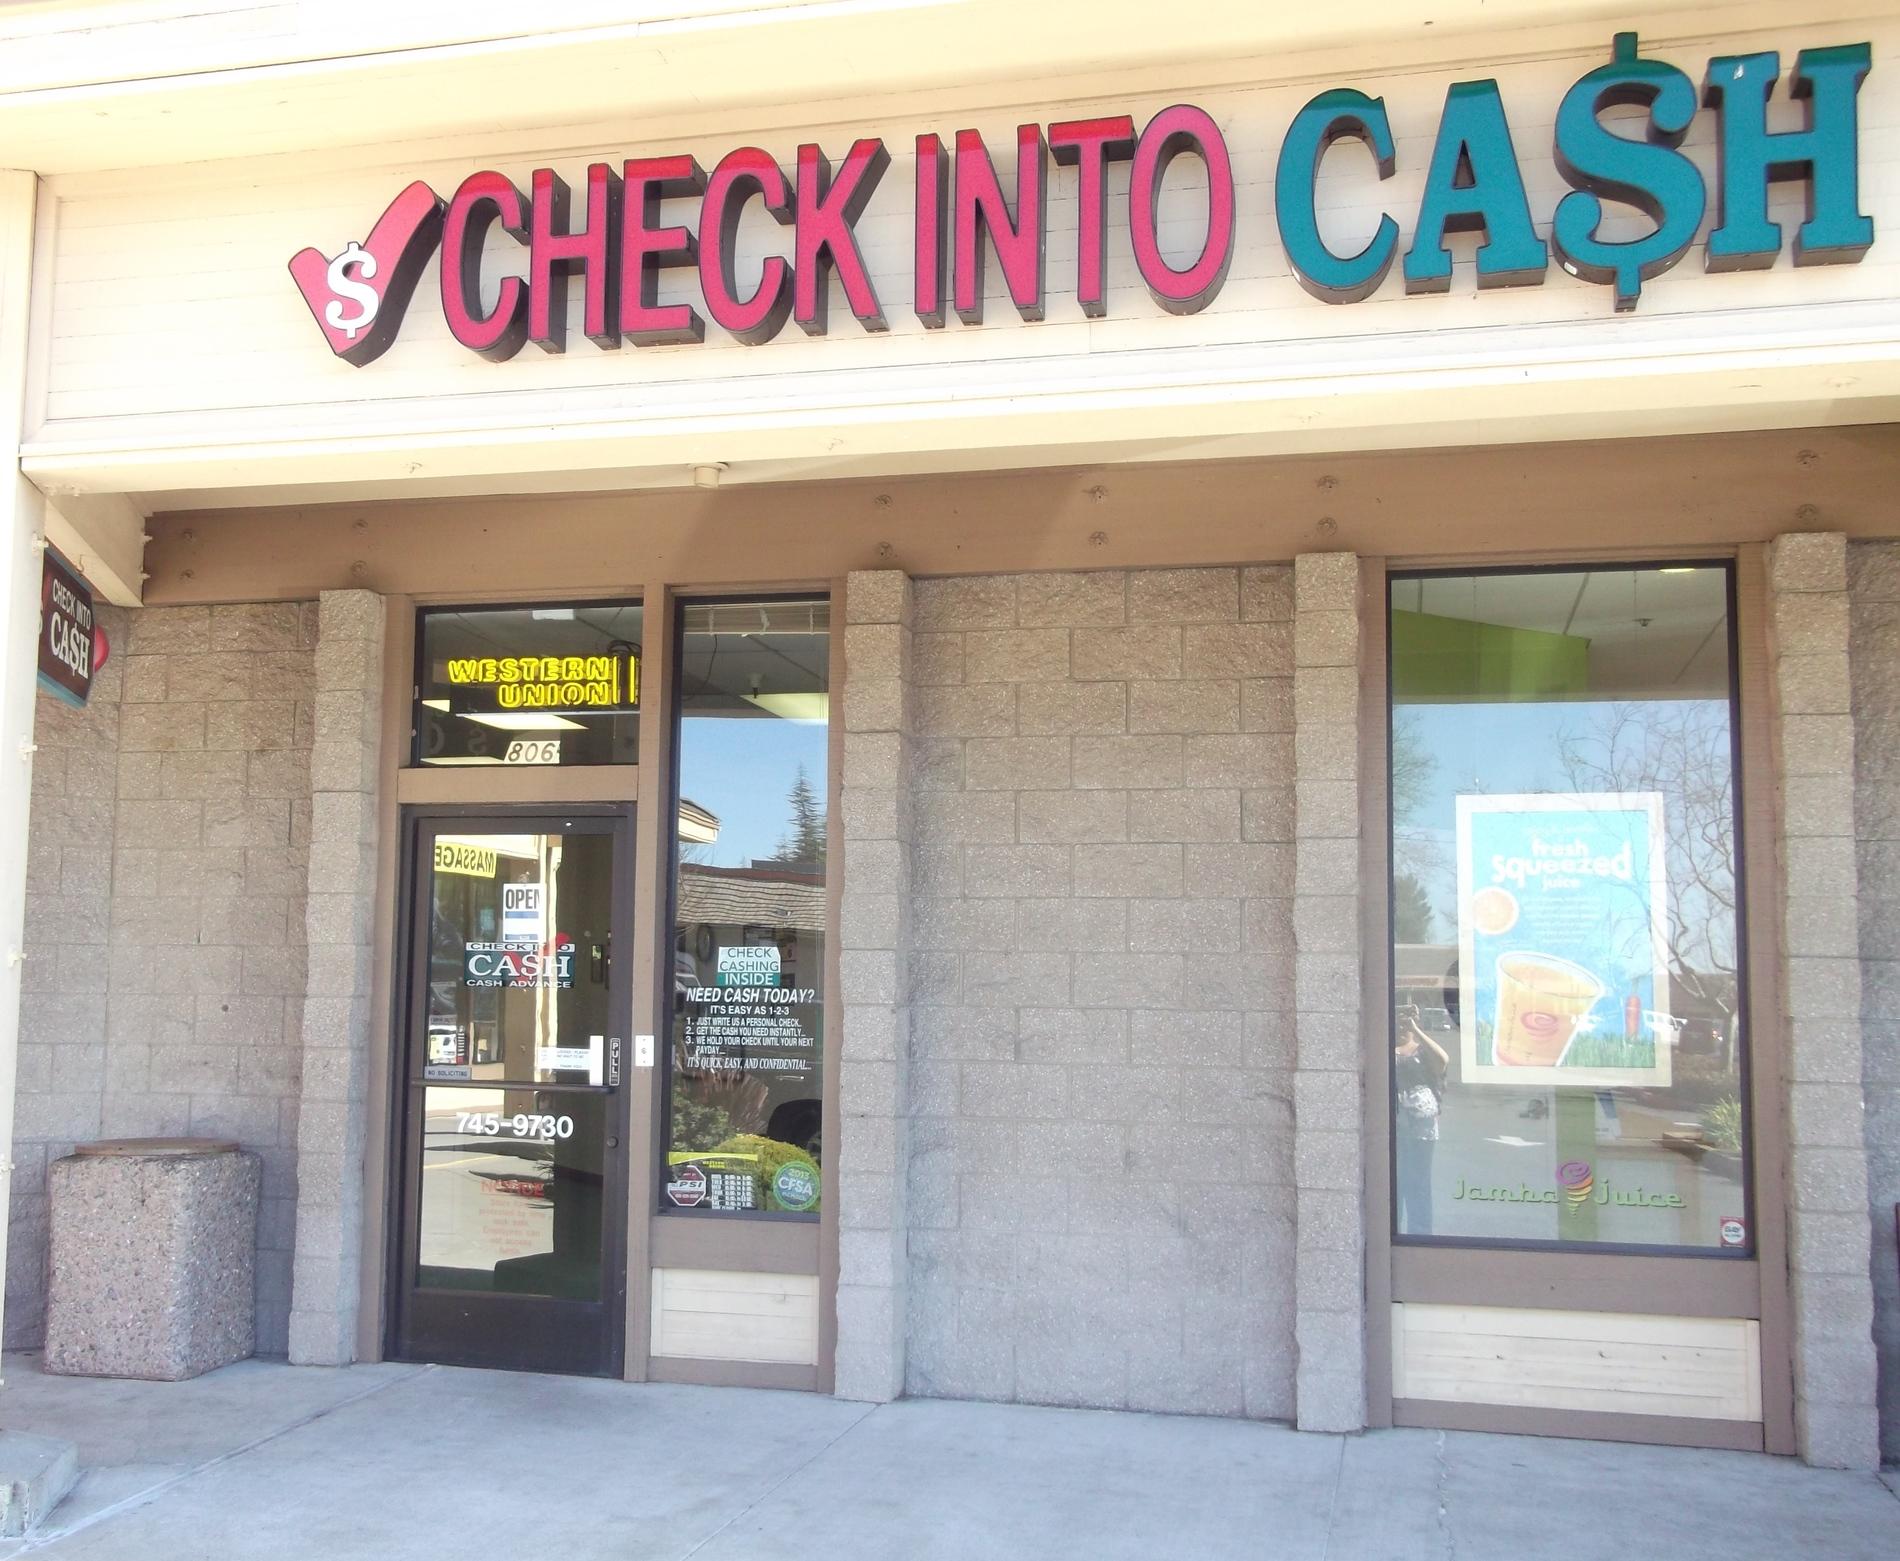 Cash up loans image 6